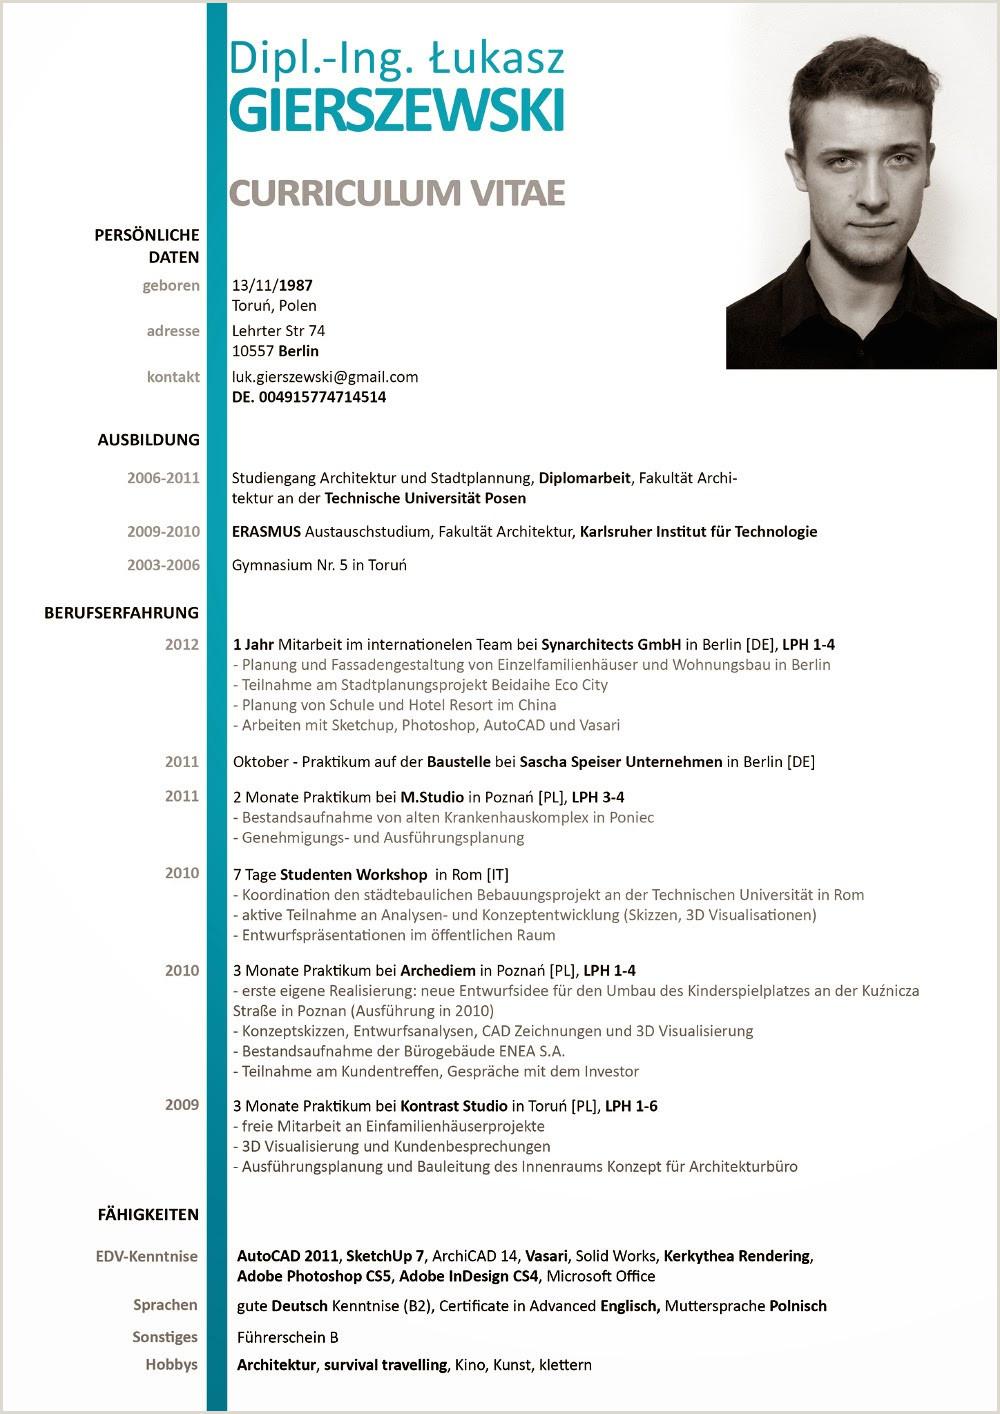 Curriculum Vitae Basico Para Rellenar E Imprimir Barato Archivos Página 2 De 3 Fotocopias Baratas